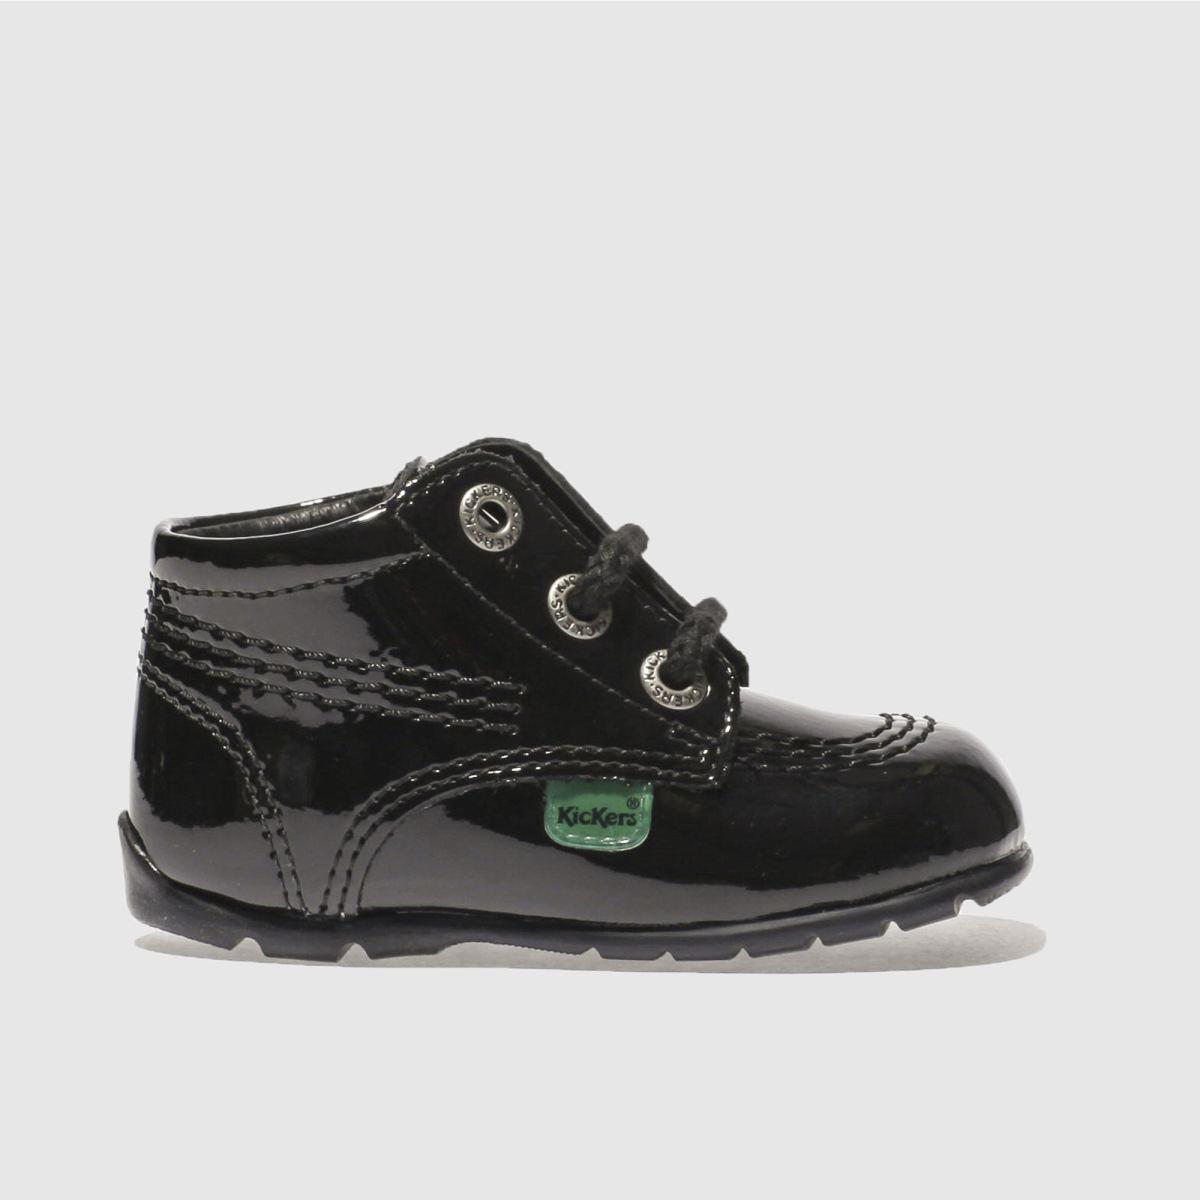 Kickers Black Kick Hi Shoes Baby